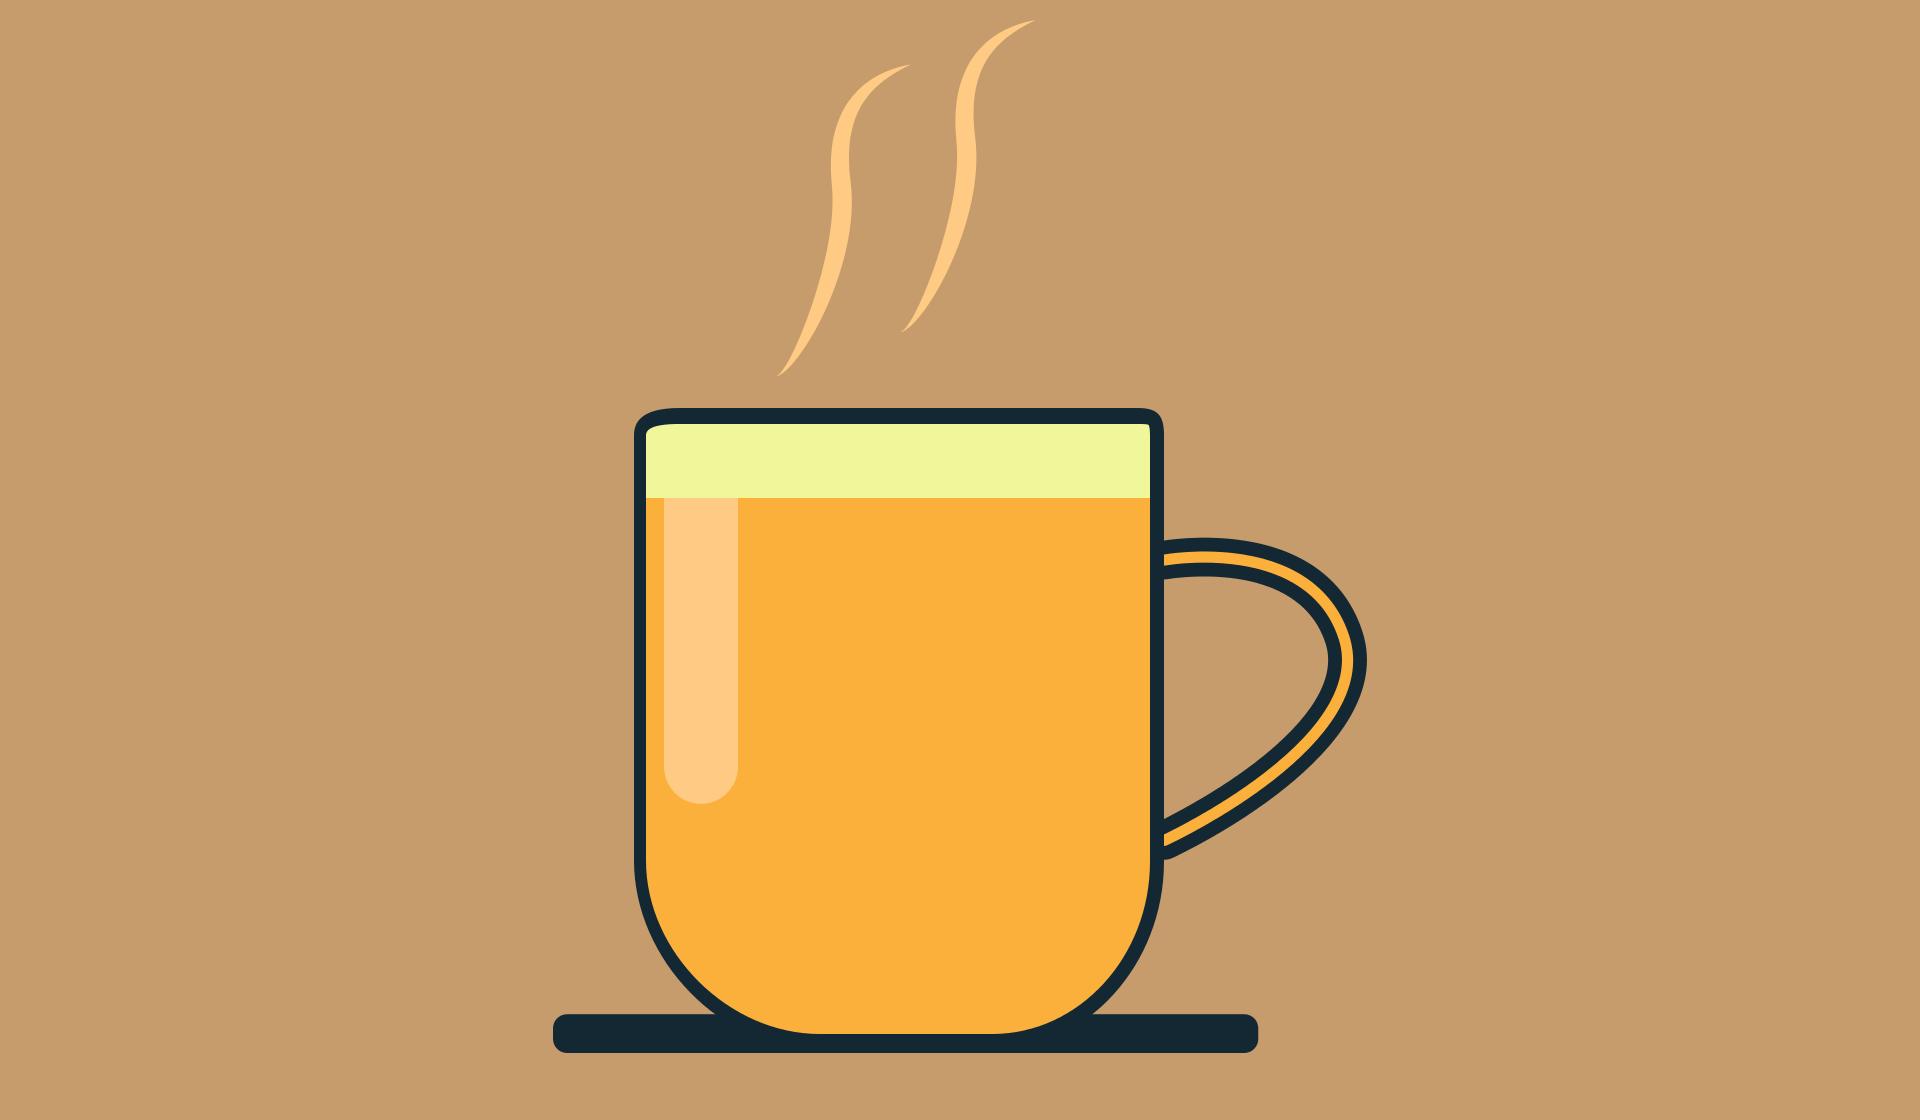 Copa, jarro, café, chá, quente, fumaça - Papéis de parede HD - Professor-falken.com